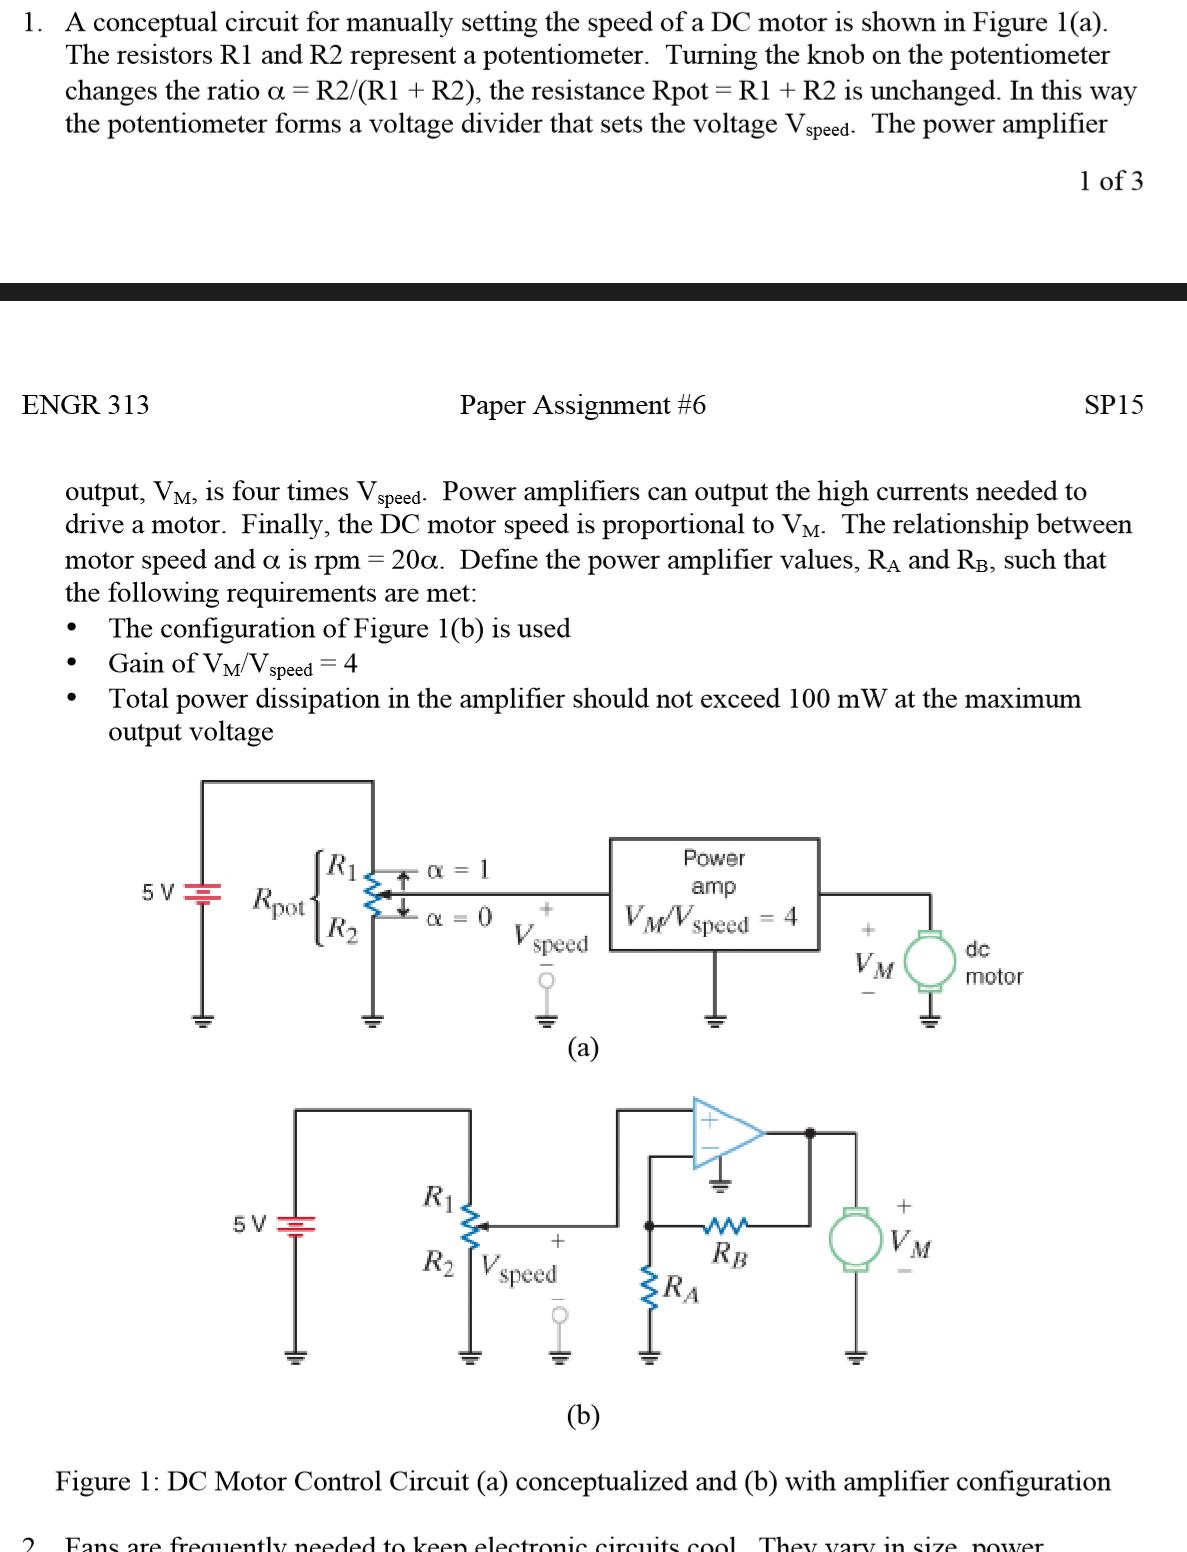 1 A Conceptual Circuit For Manually Setting The S Speedcontrolcircuitjpg